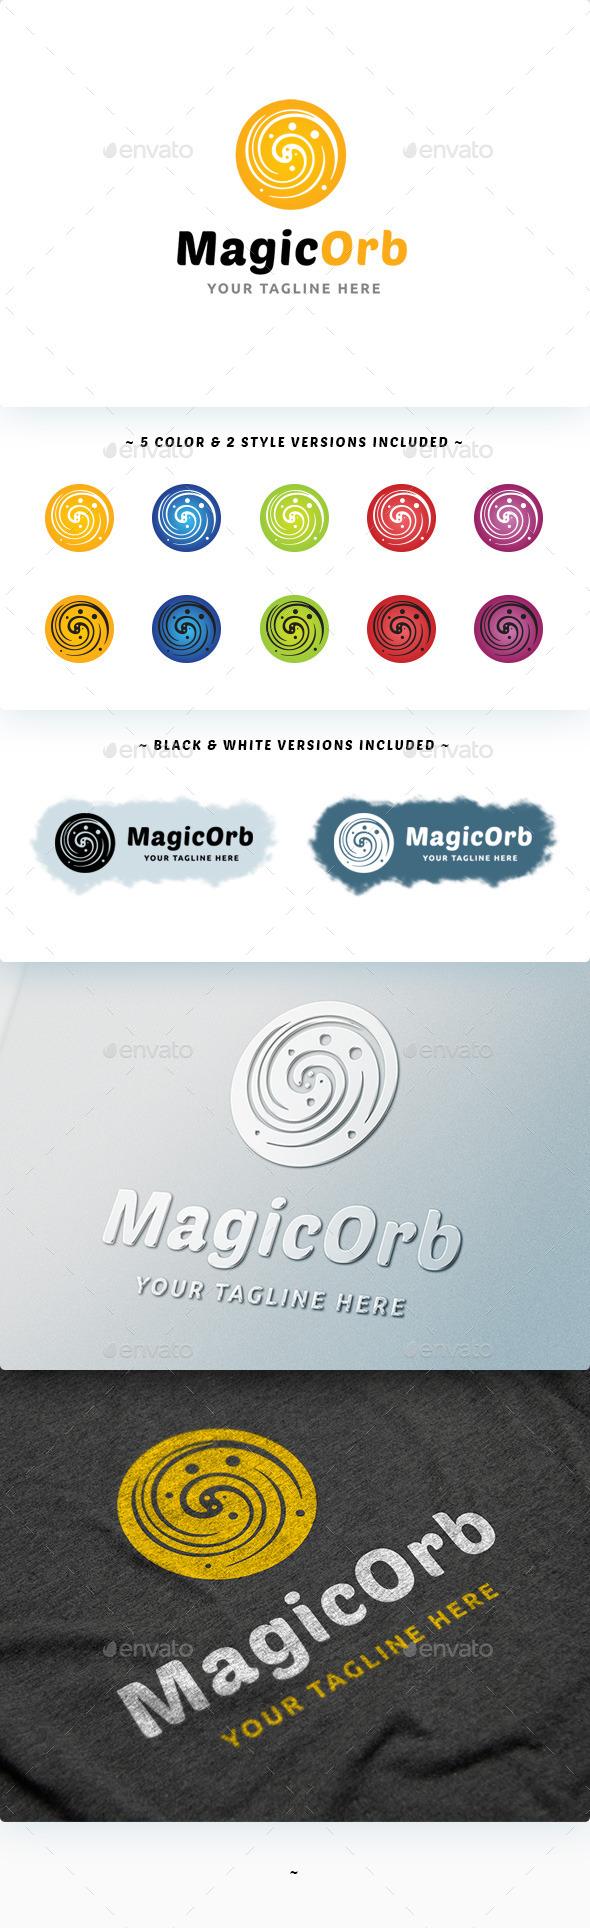 Magic Orb Logo - Abstract Logo Templates